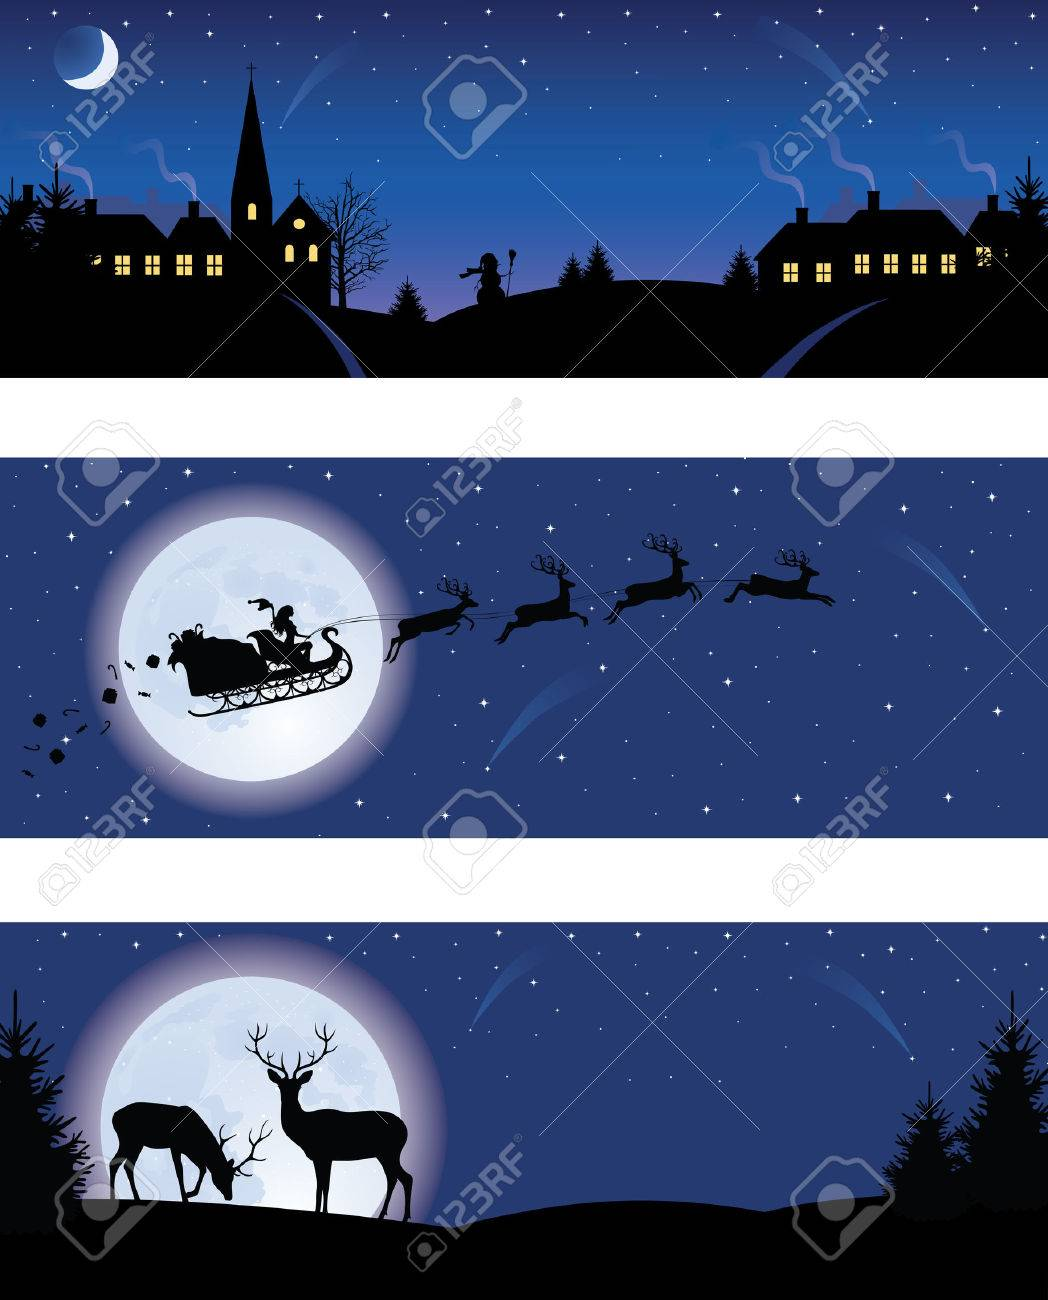 Christmas banners. Stock Vector - 8019885